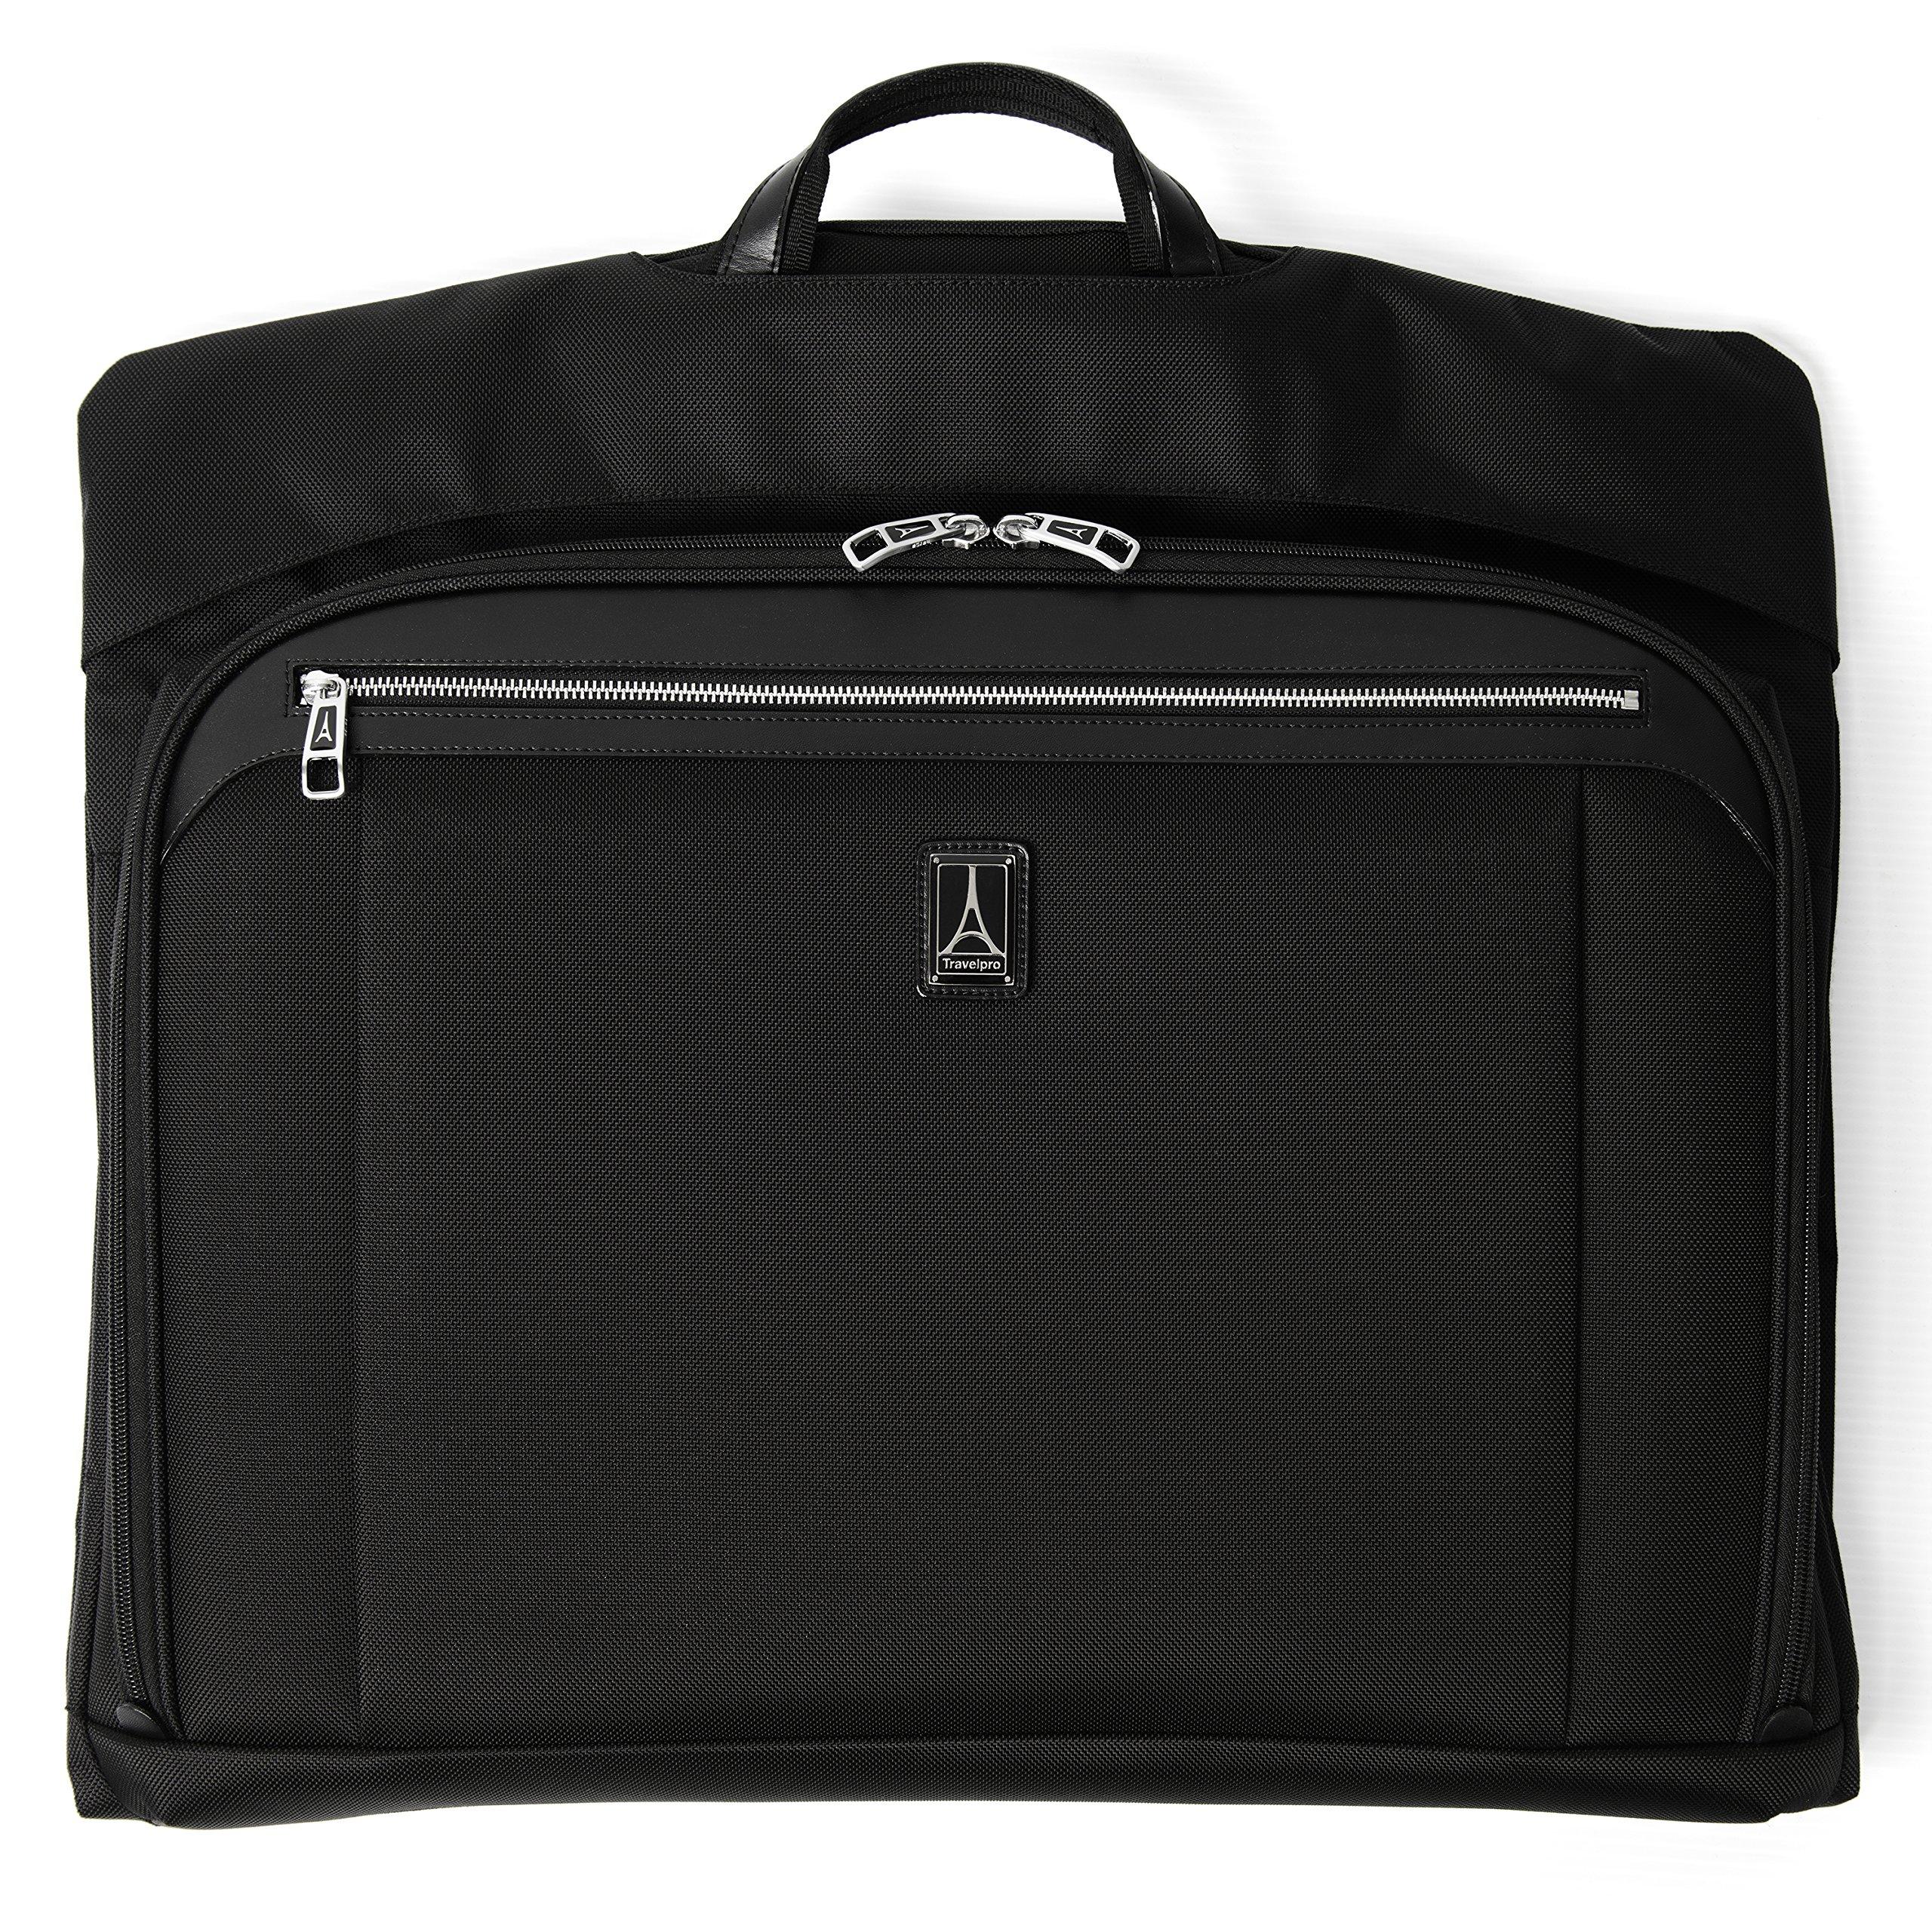 Travelpro Luggage Platinum Elite 22'' Bi-Fold Carry-on Garment Valet, Shadow Black